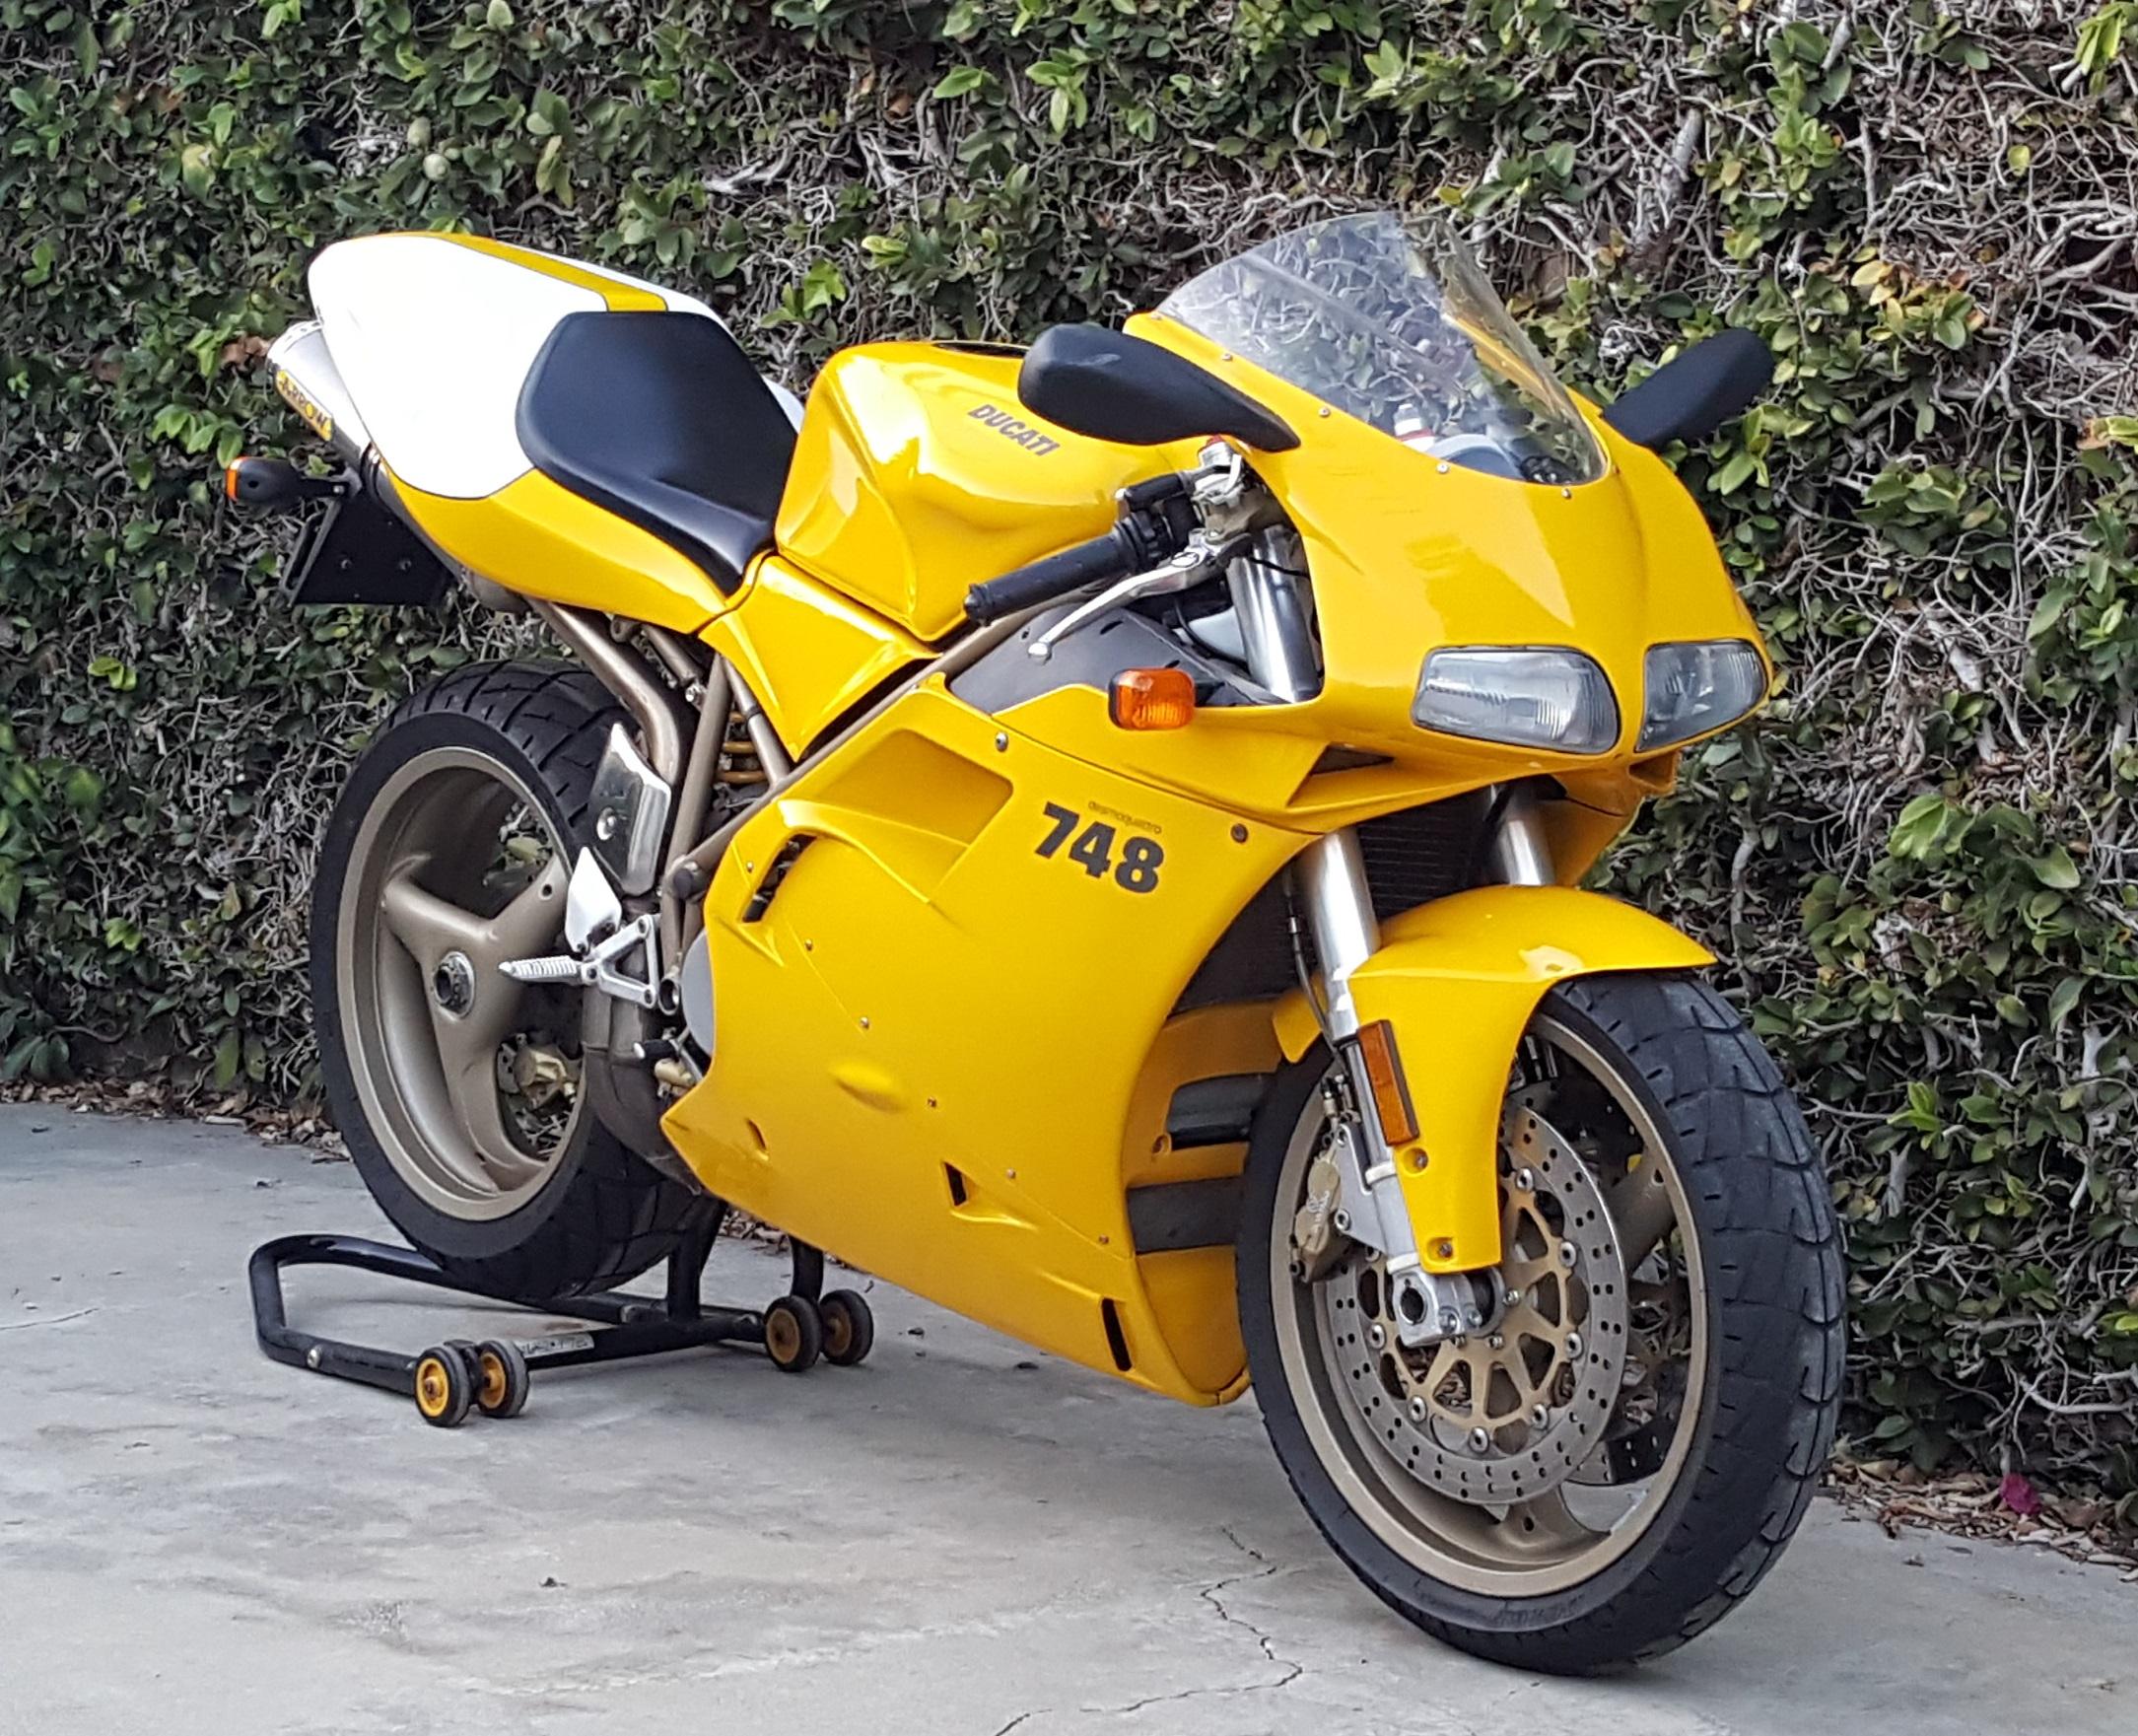 2000 Ducati 748/916 Restoration